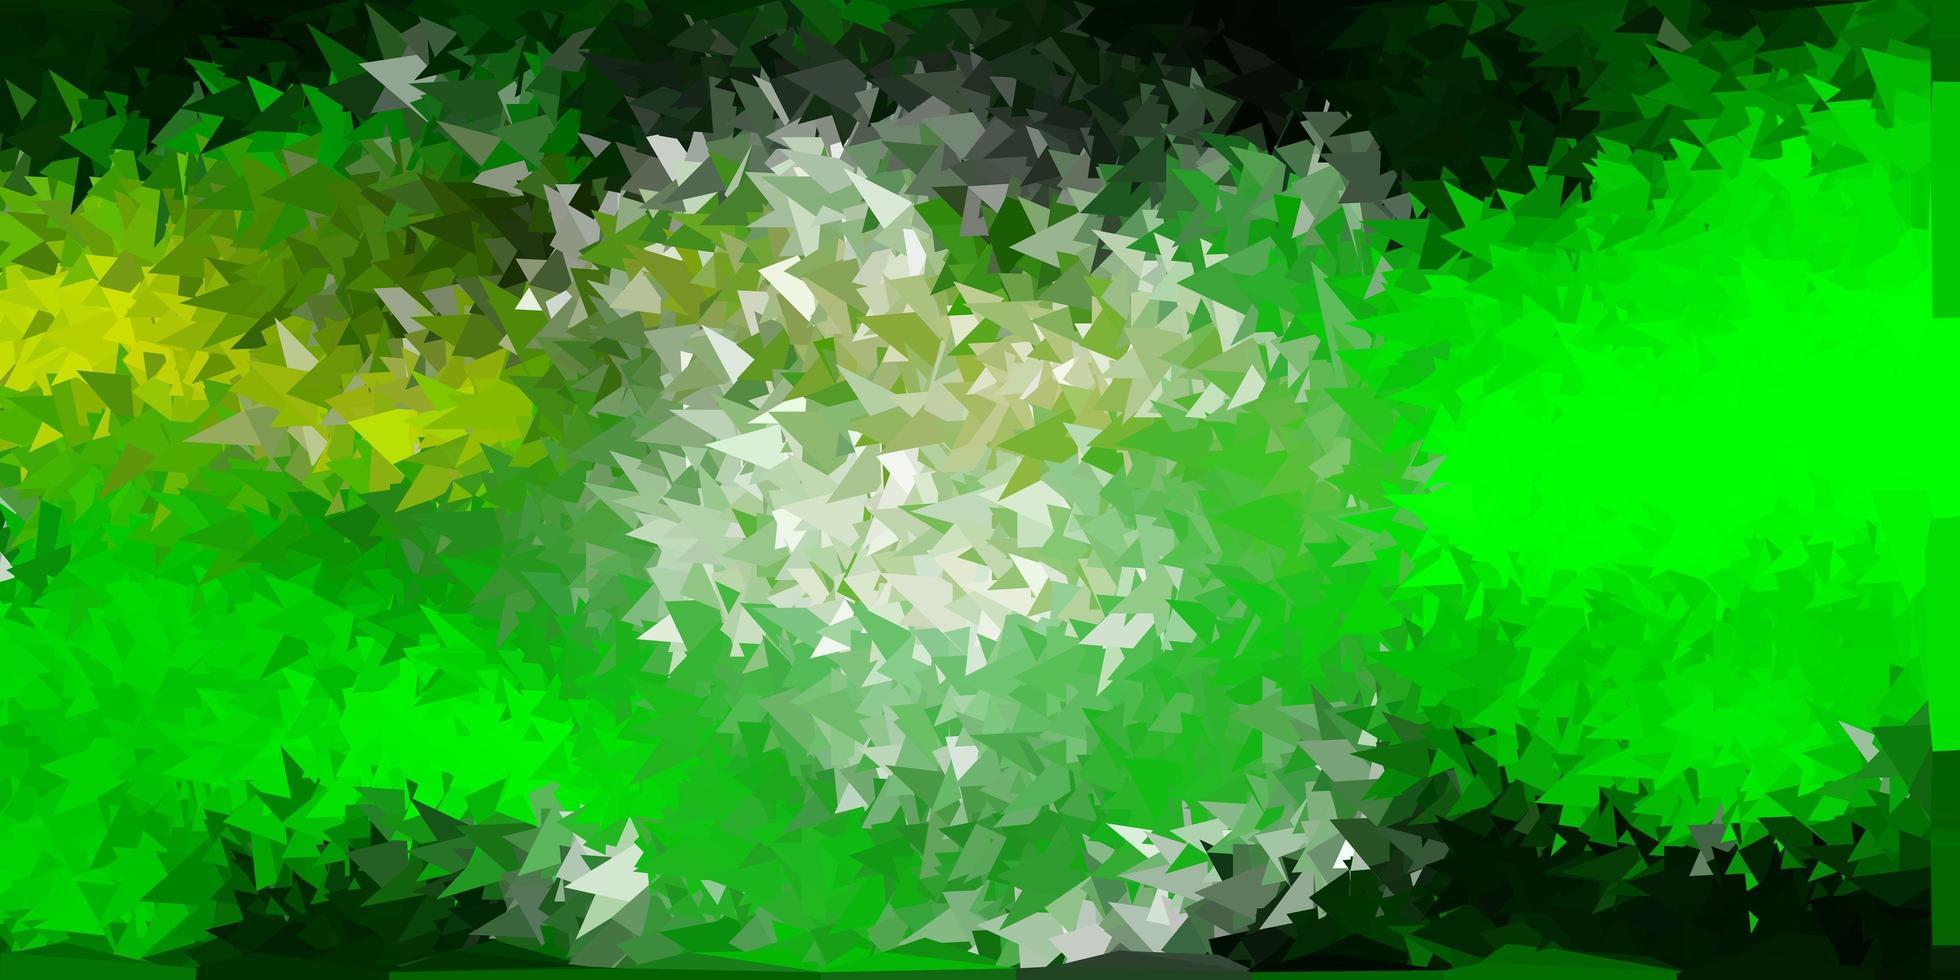 ljusgrönt, gult triangelmosaikmönster. vektor